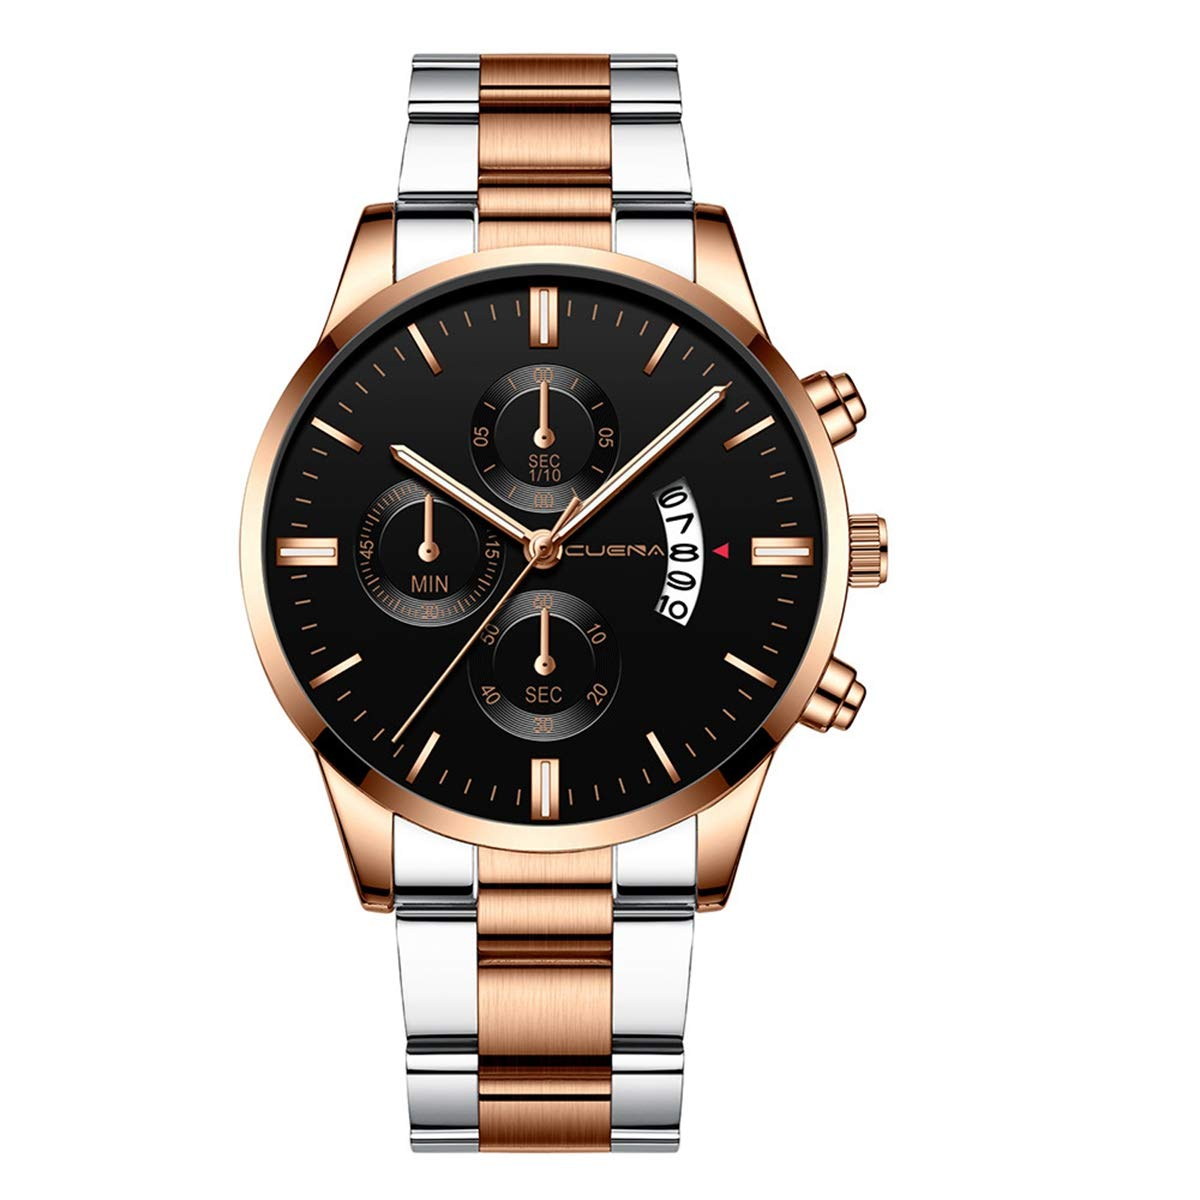 ZODRQ Men's Watch,Fashion Waterproof Sport Watches Stainless Steel Wrist Watch Wristwatch Date Quartz Watch for Men Gift (F) by ZODRQ